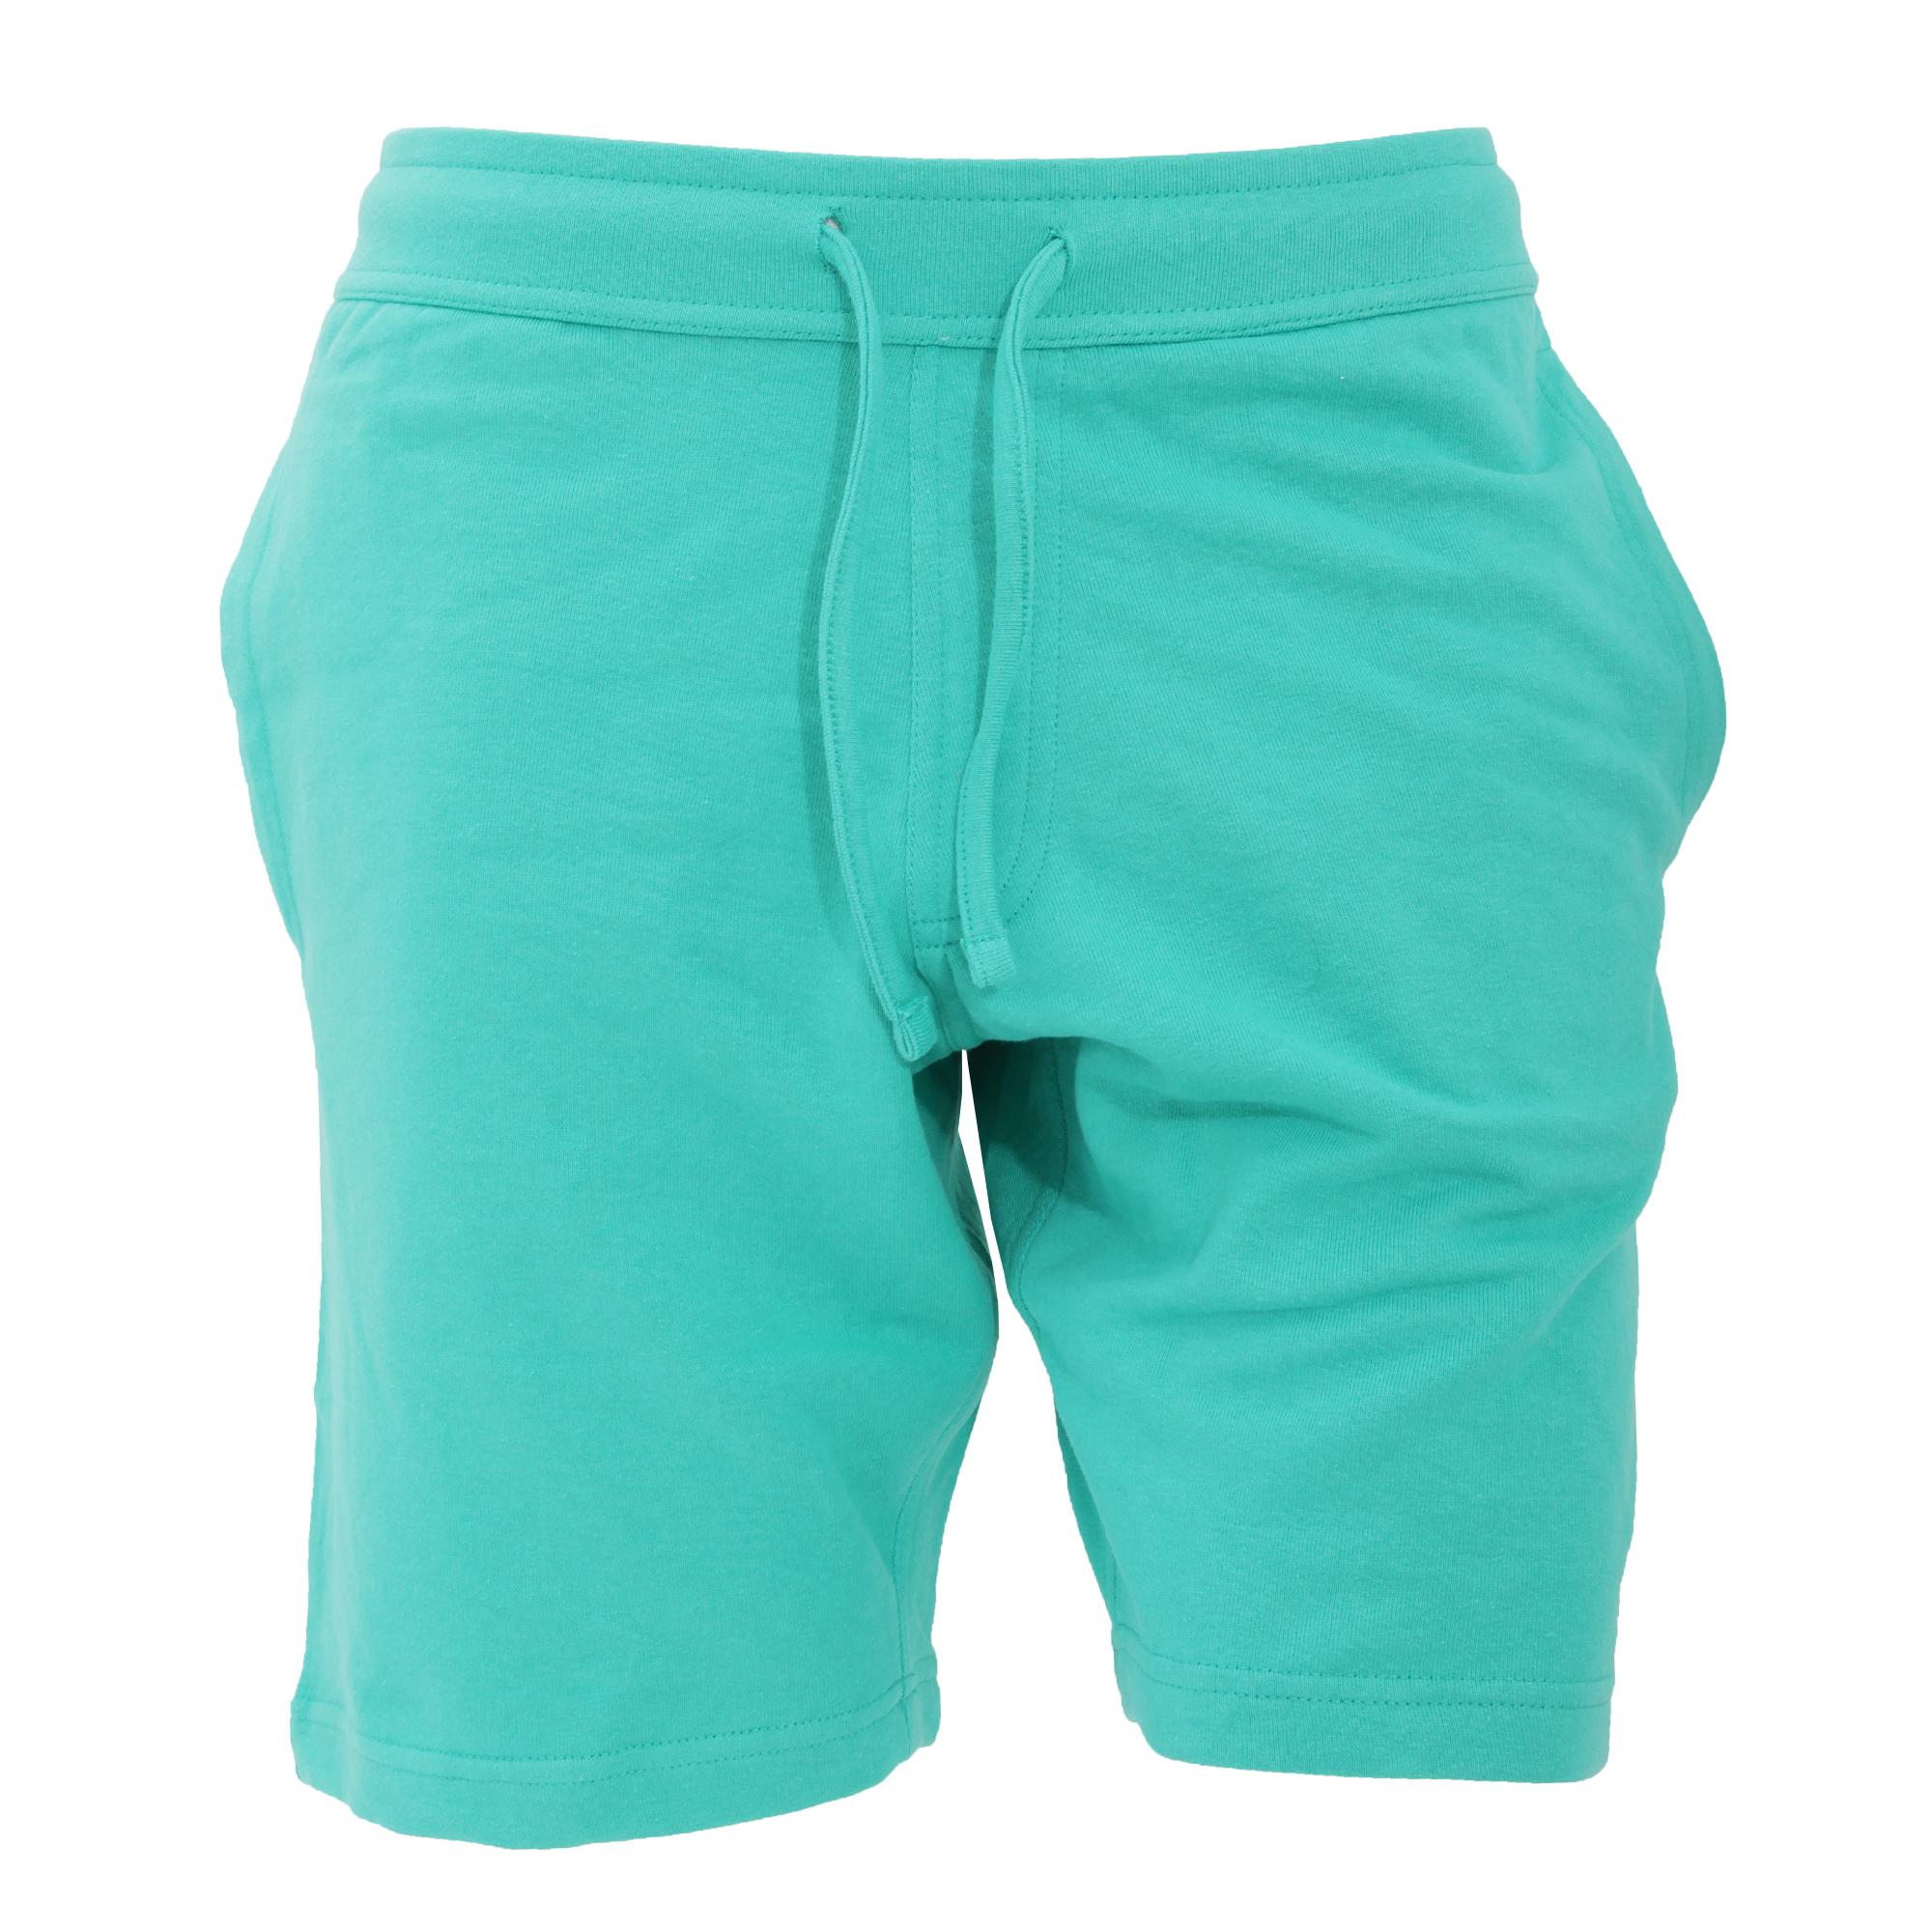 B&C Paradise Mens Sports Splash Sweatpants /Sweats Casual ...